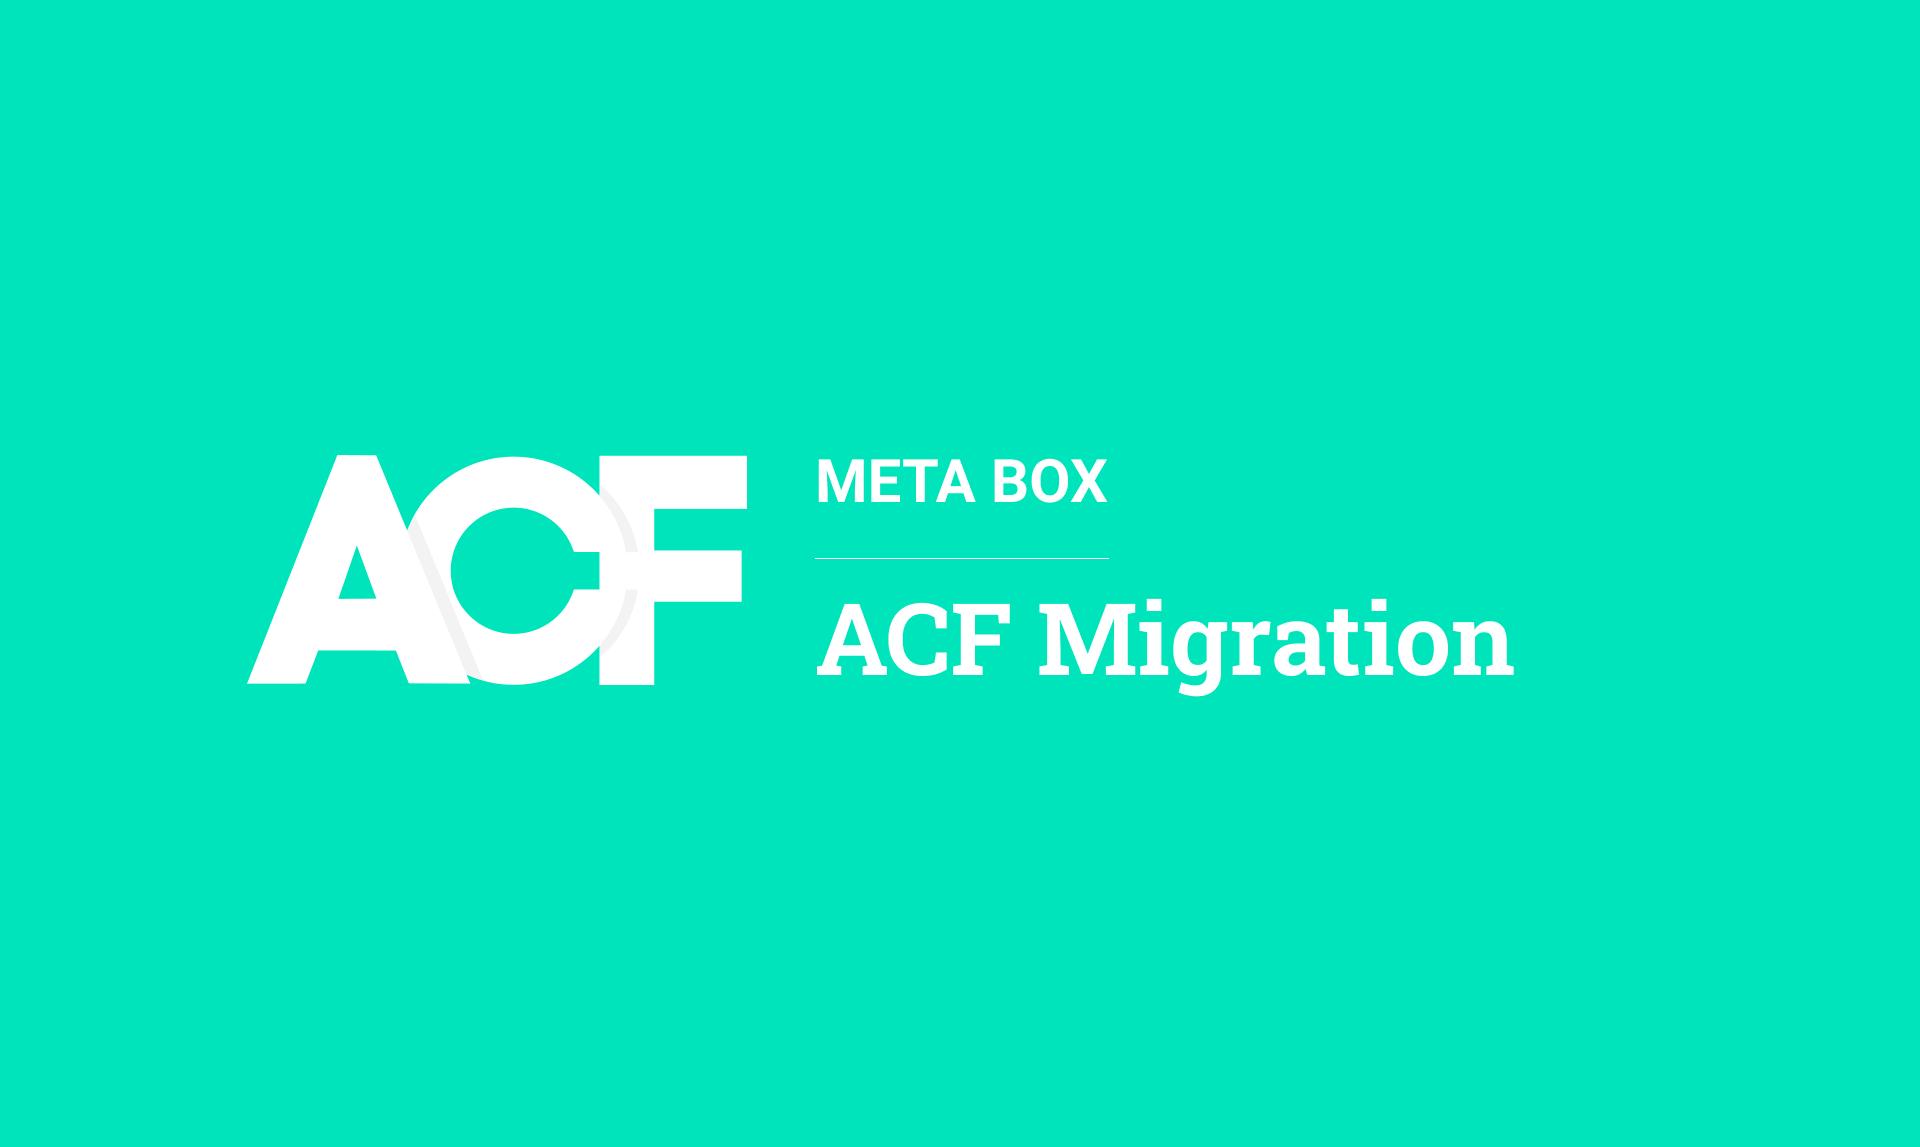 MB ACF Migration